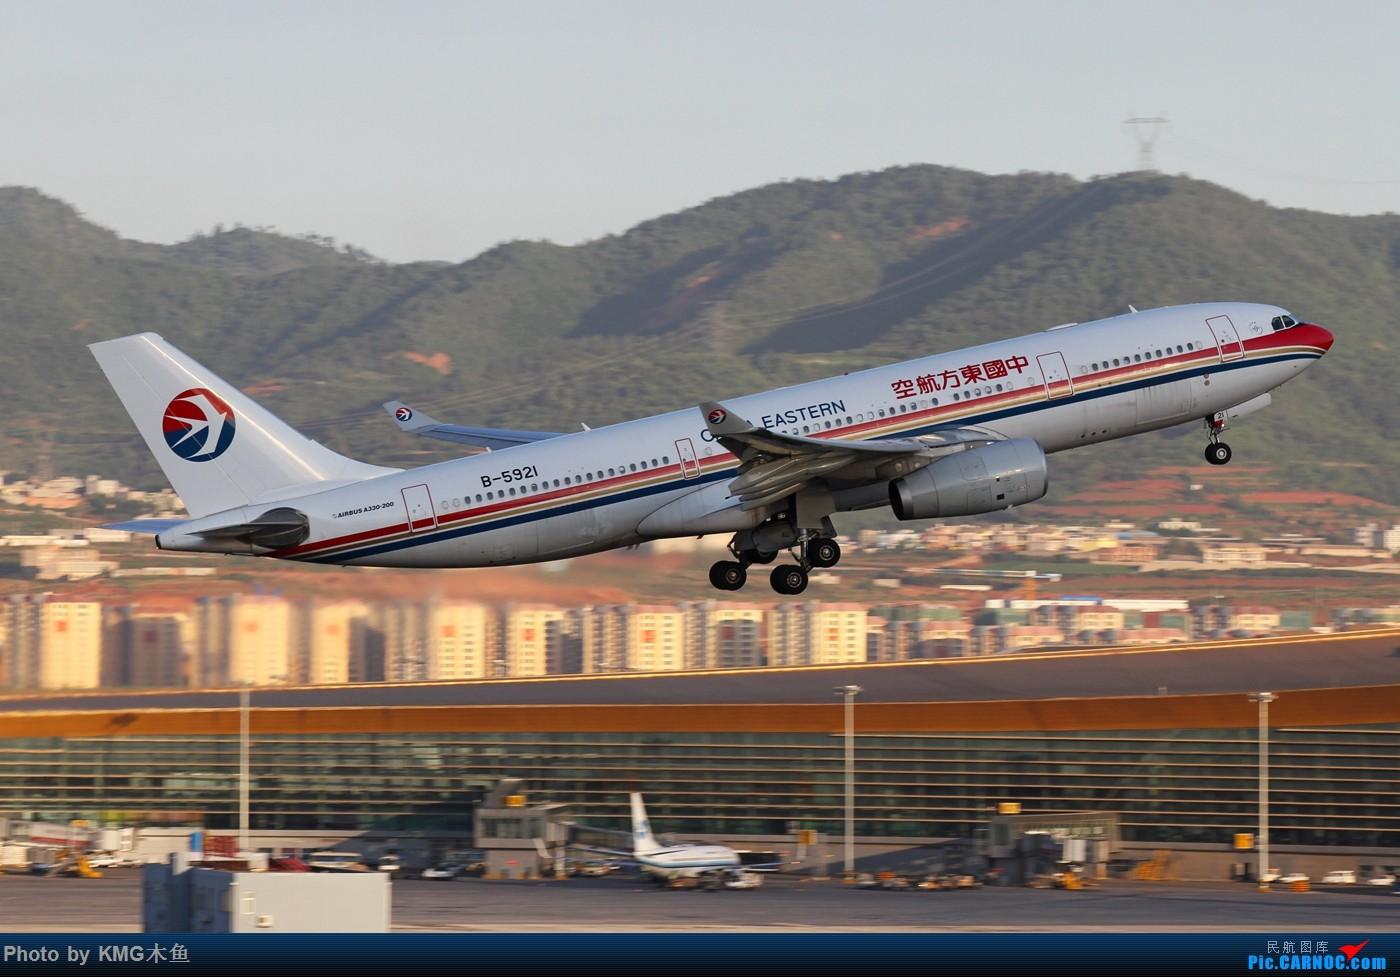 Re:[原创]【KMG】【昆明长水国际机场的东航330】东航云南高颜值的330,1600大图欣赏 AIRBUS A330-200 B-5921 中国昆明长水国际机场